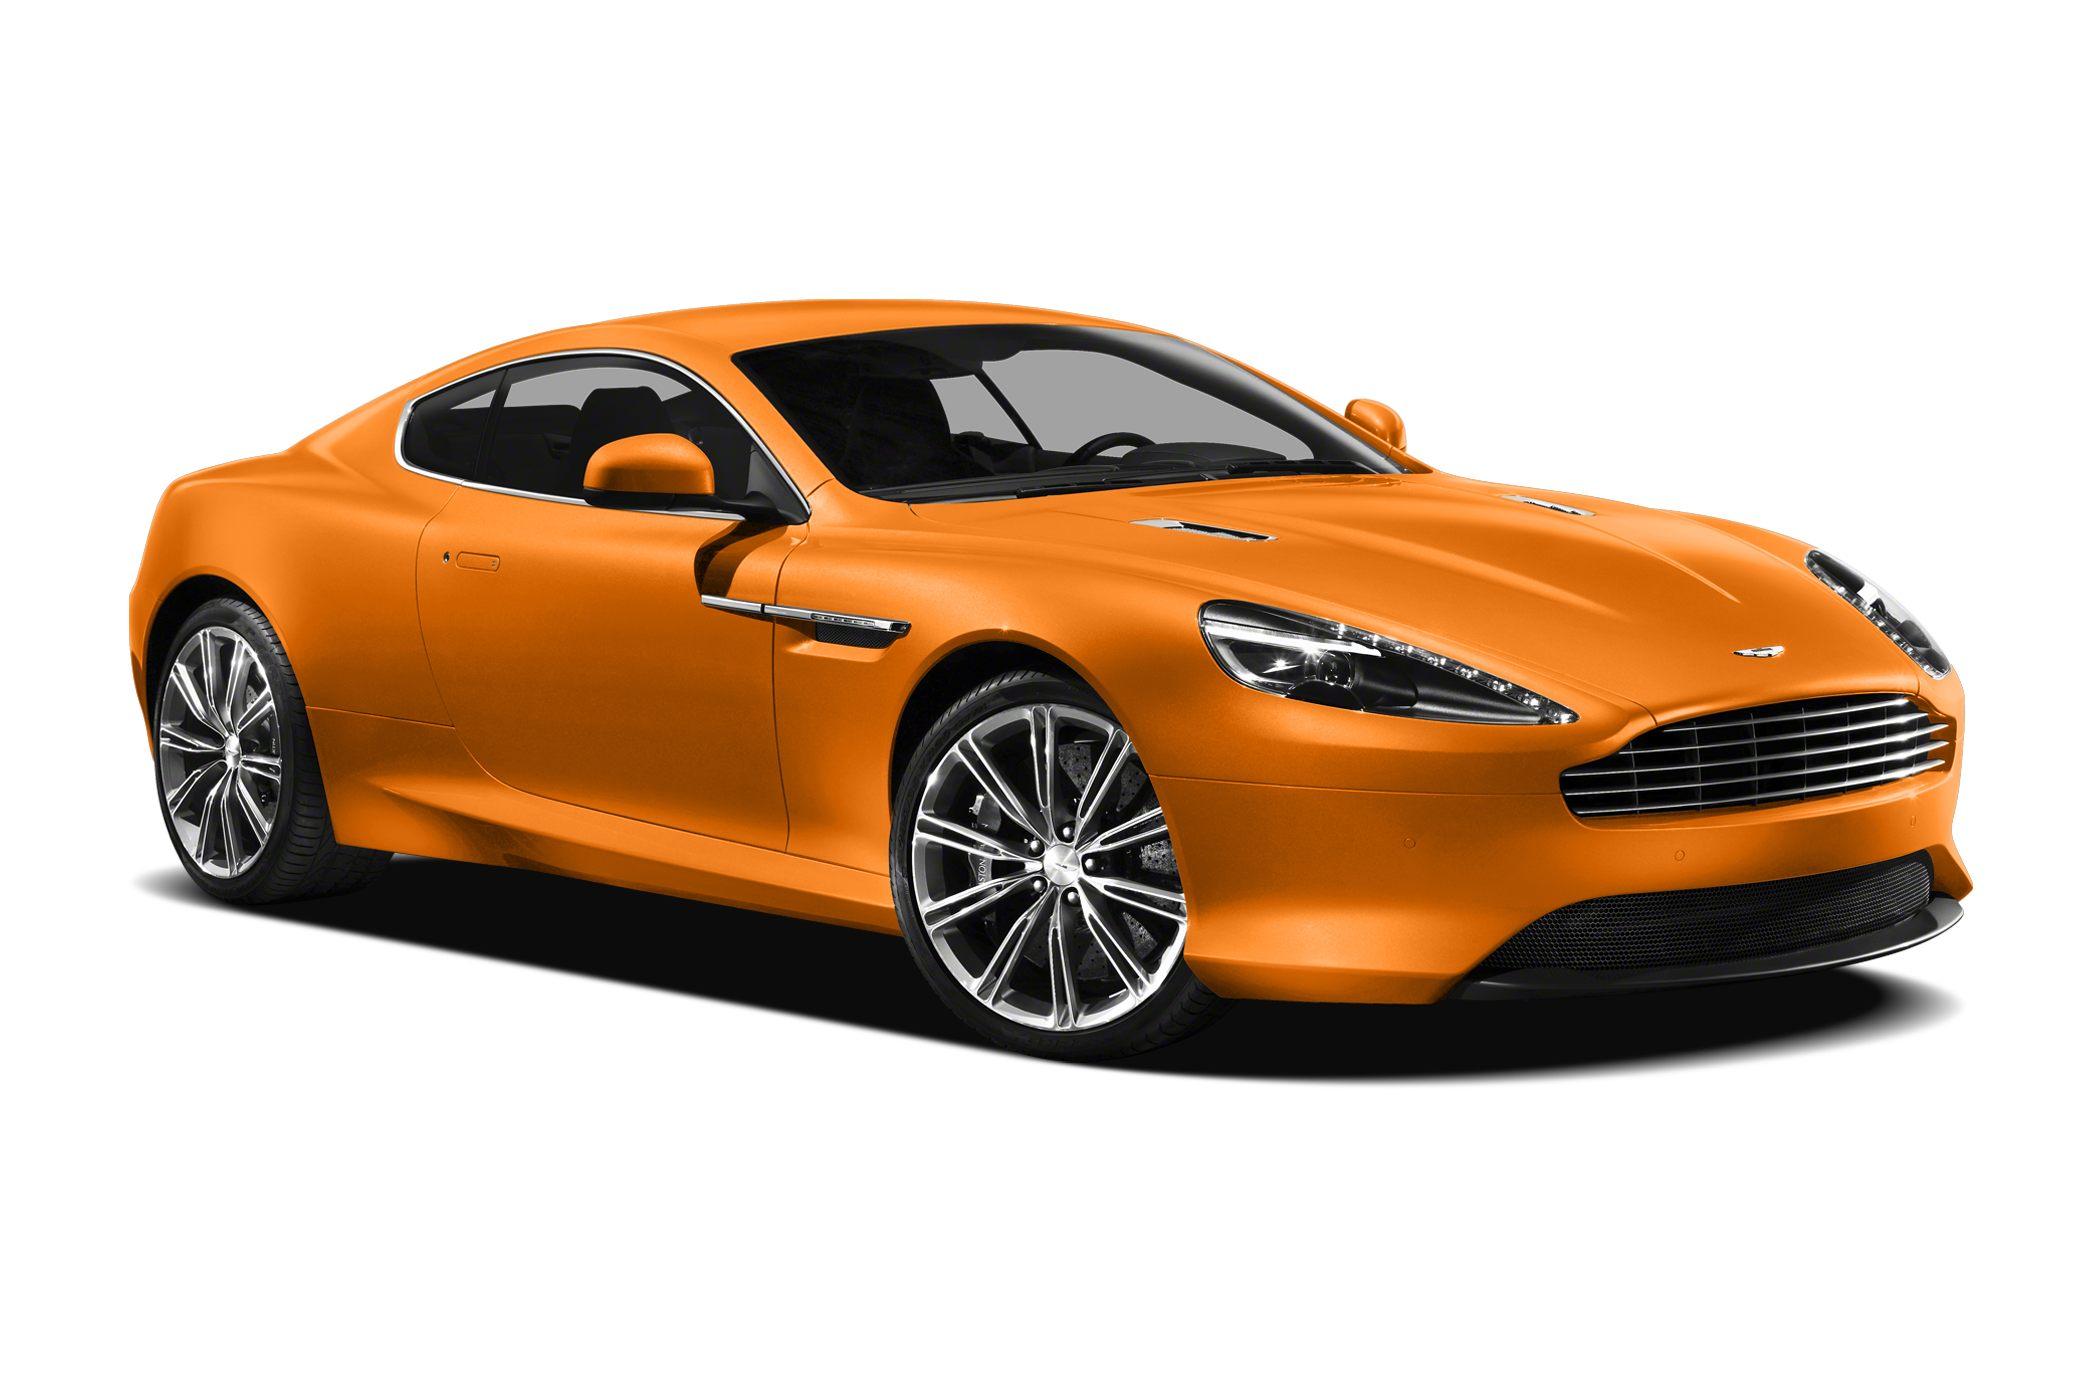 2011 Aston Martin Virage